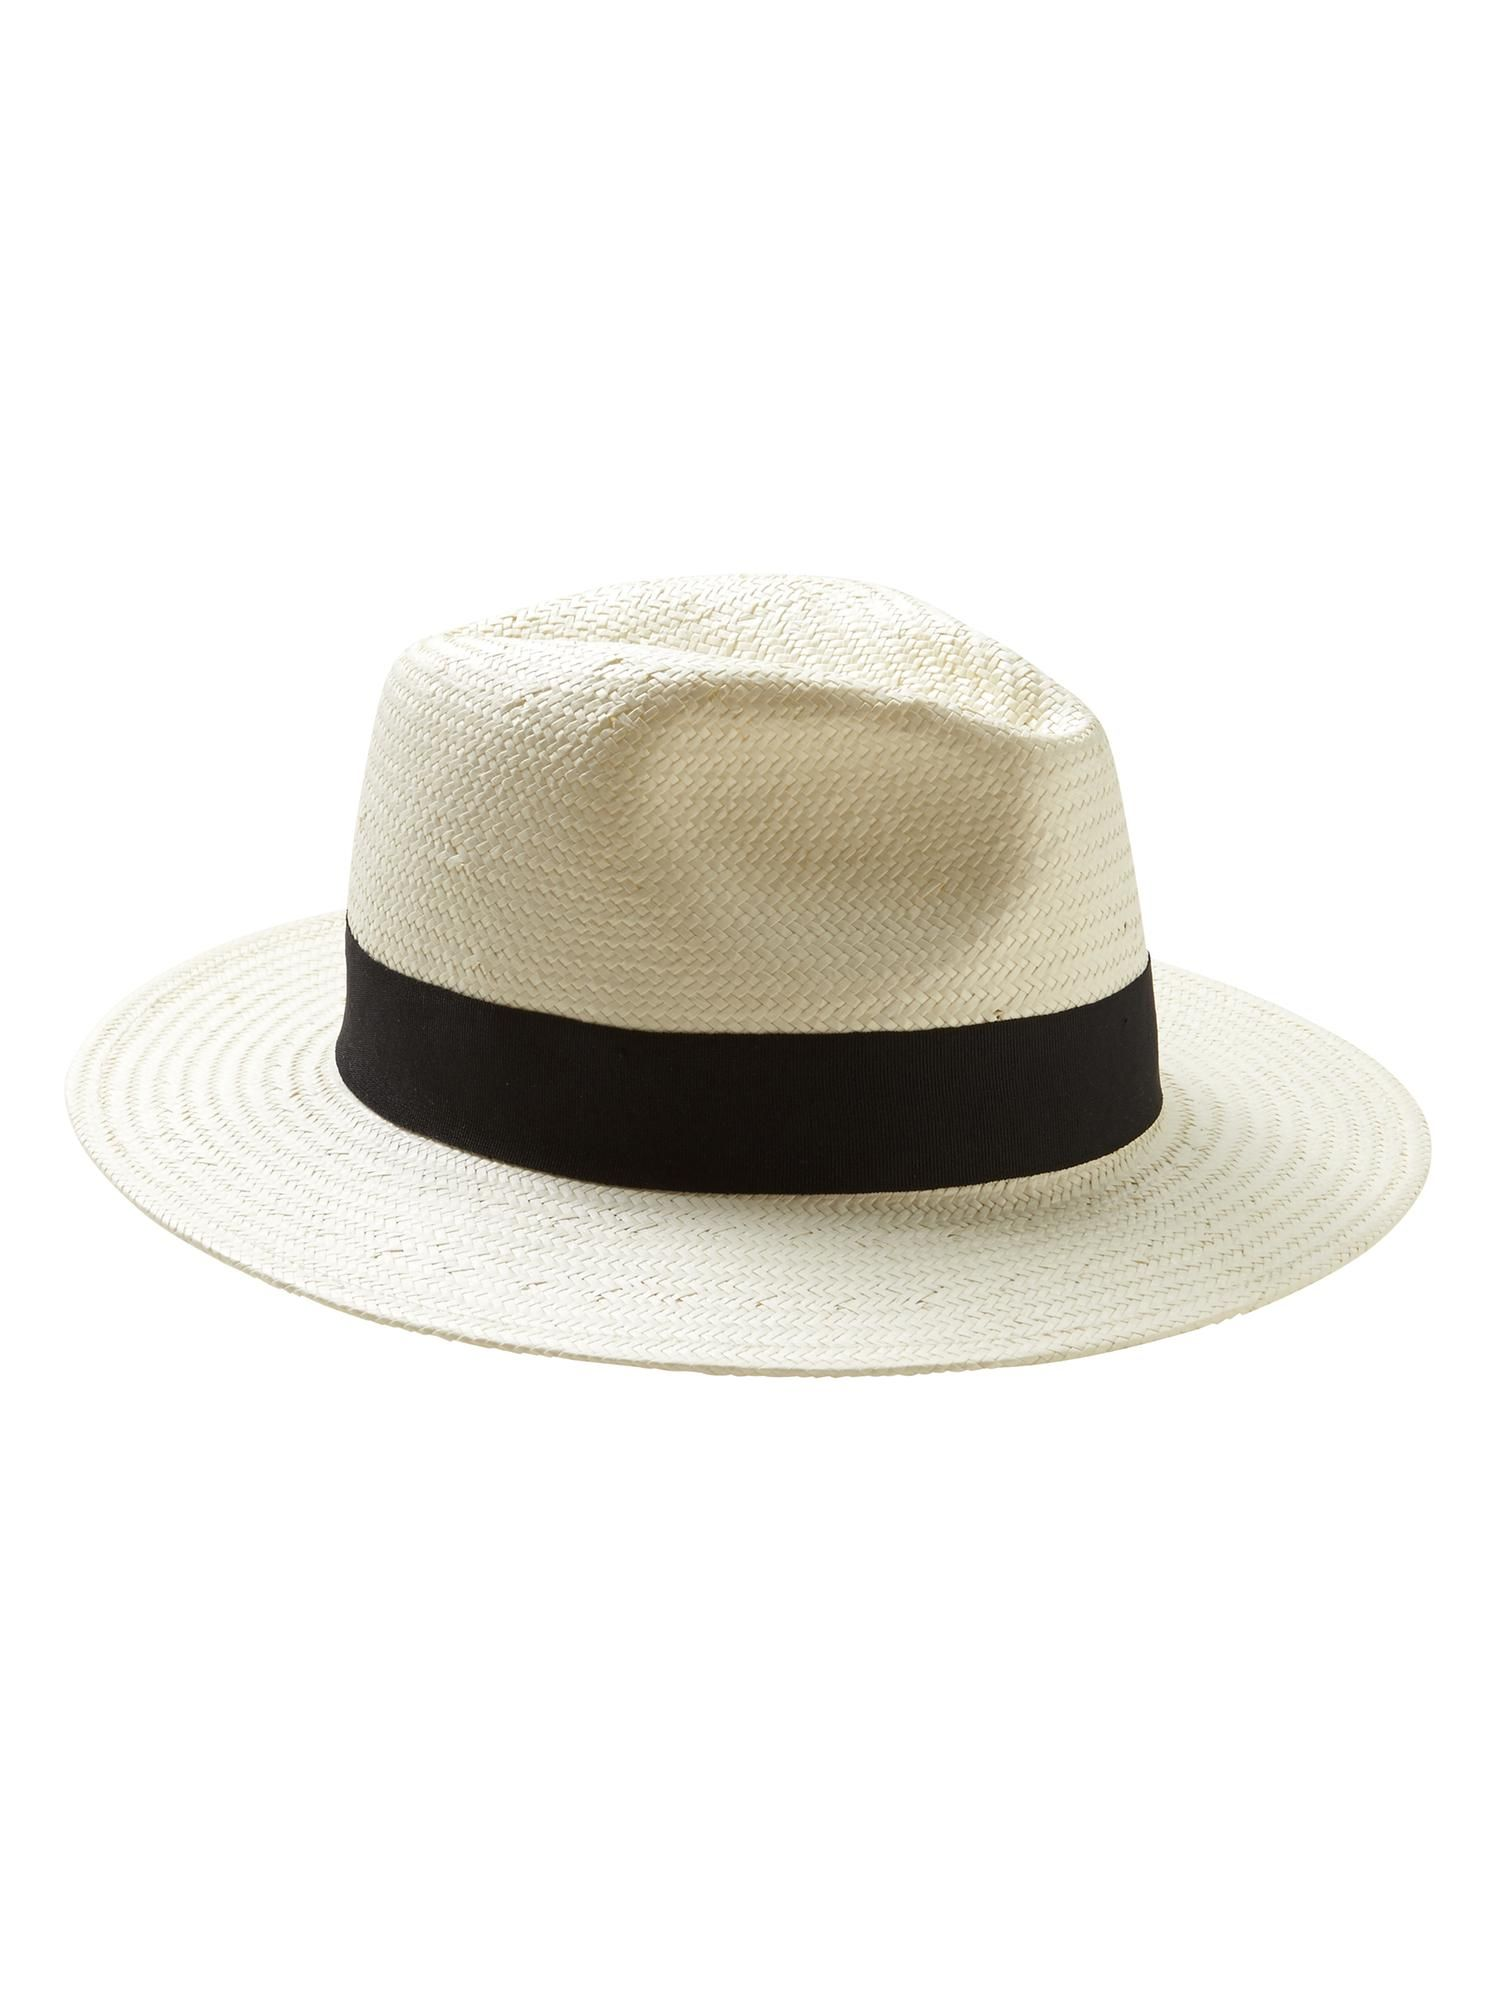 5cfb5137 Neutral Panama Hat | Banana Republic Factory | S/S 2017 Fashion ...